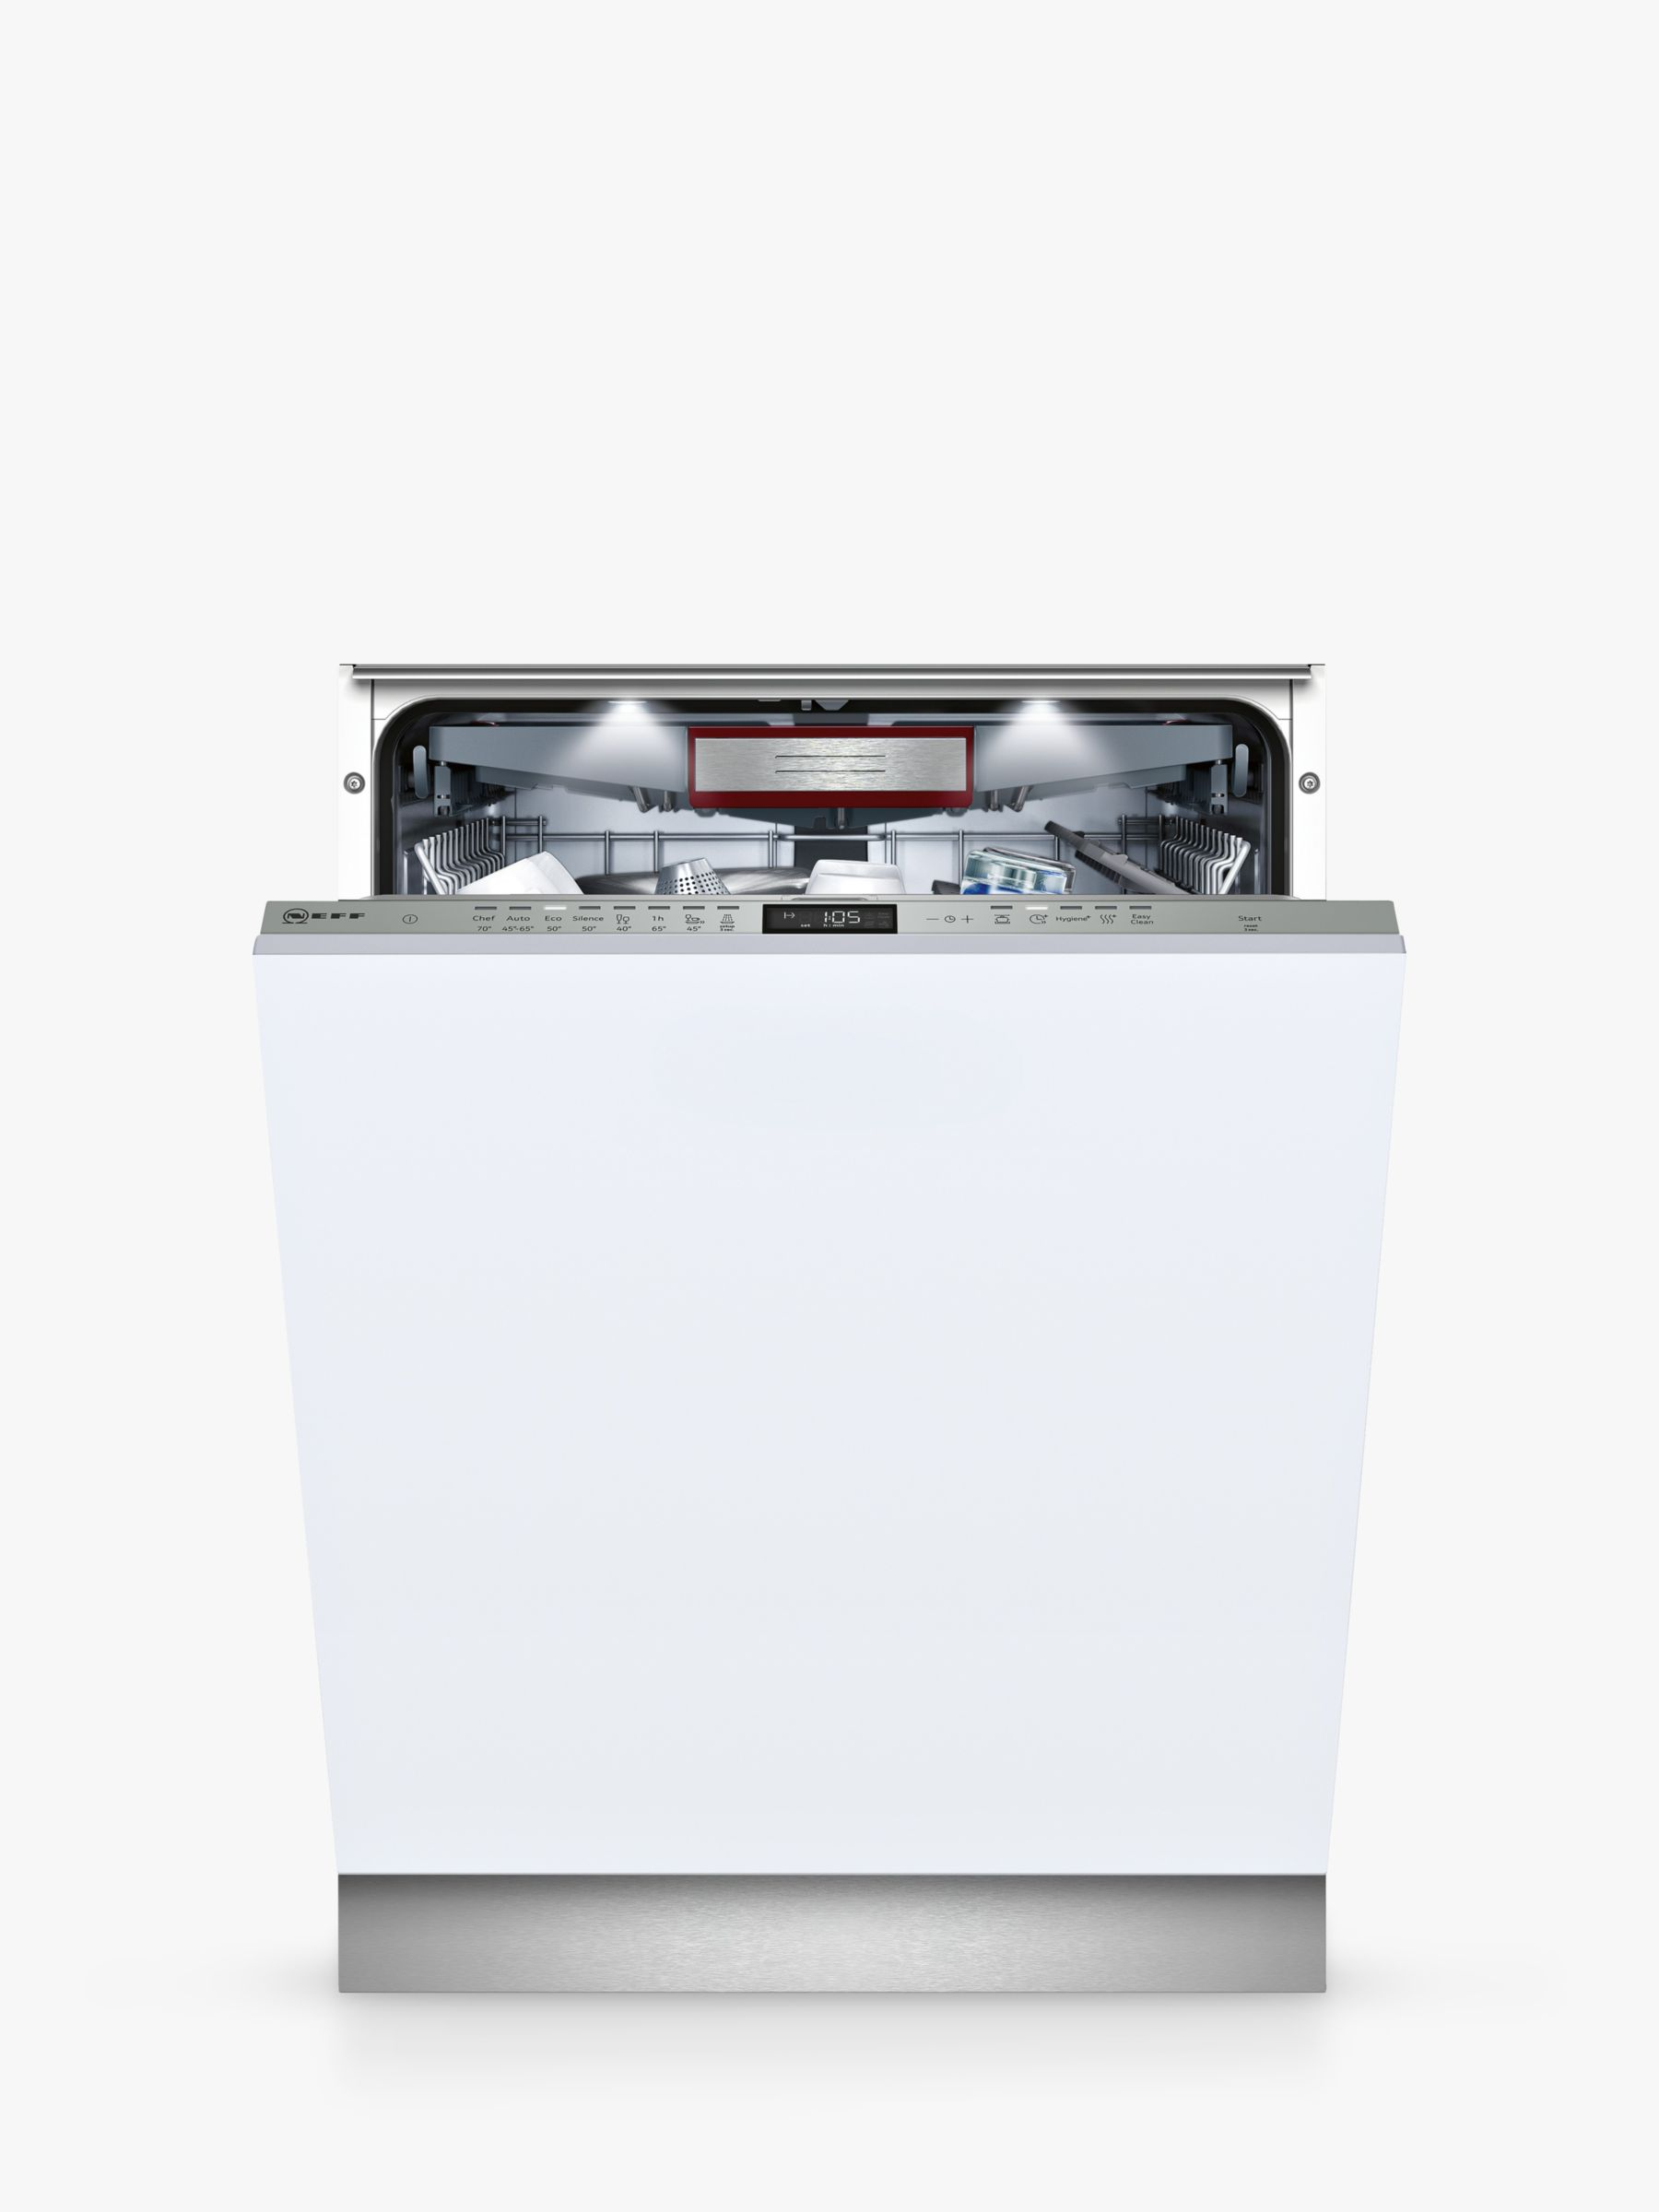 NEFF Neff S515T80D1G Integrated Dishwasher, White